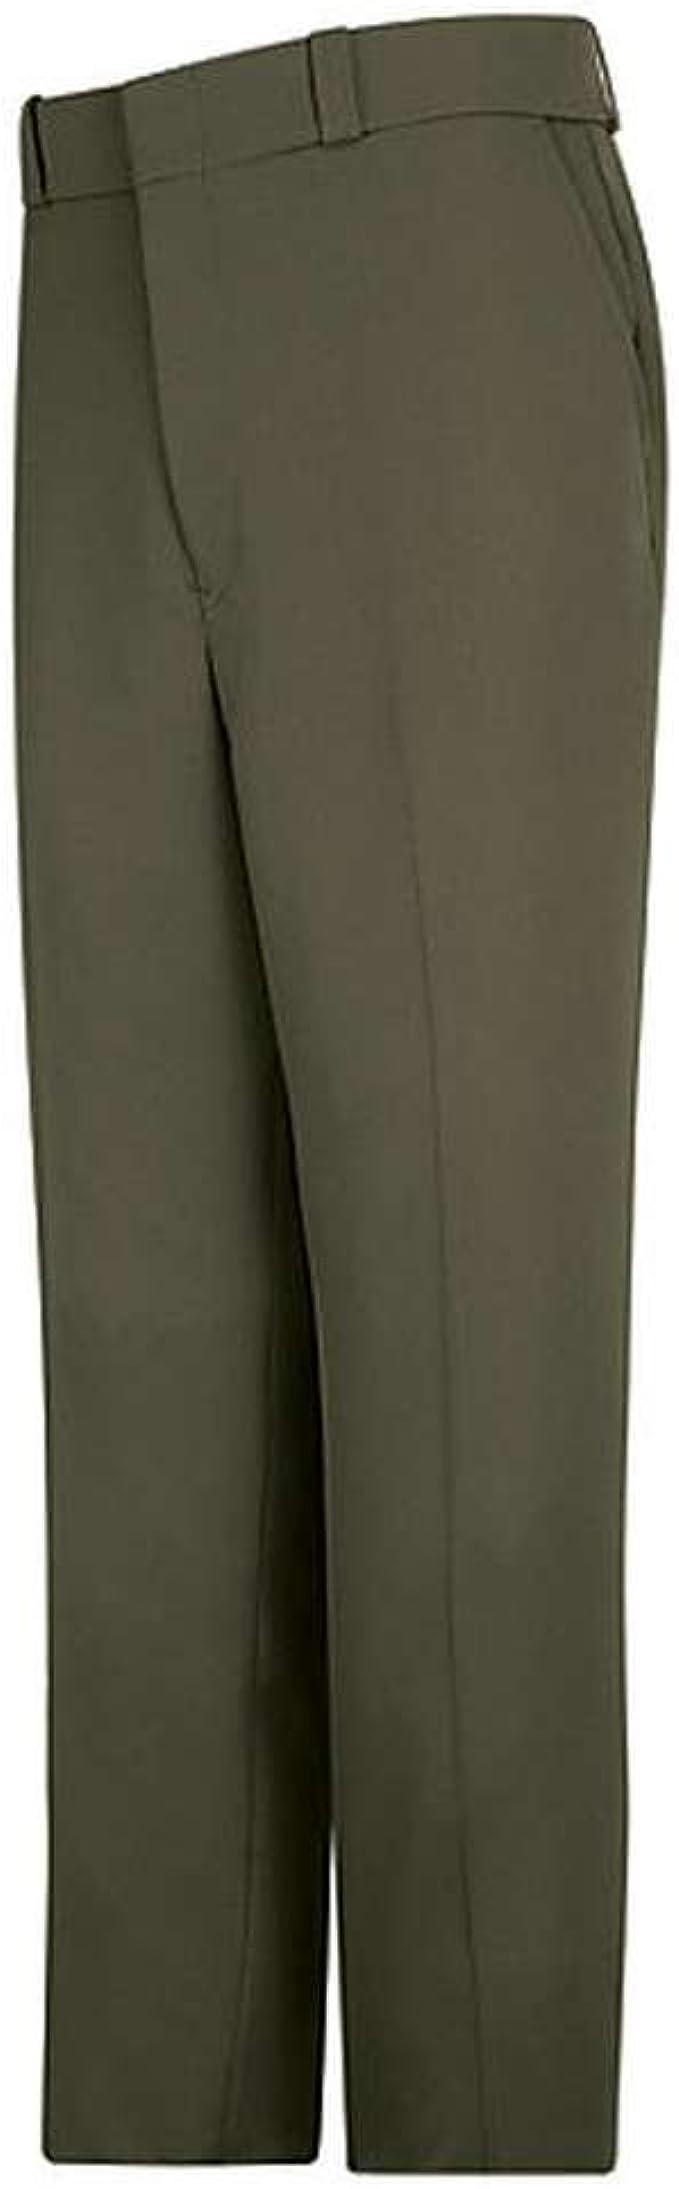 Black Horace Small Sentry Plus Trouser 50R37U